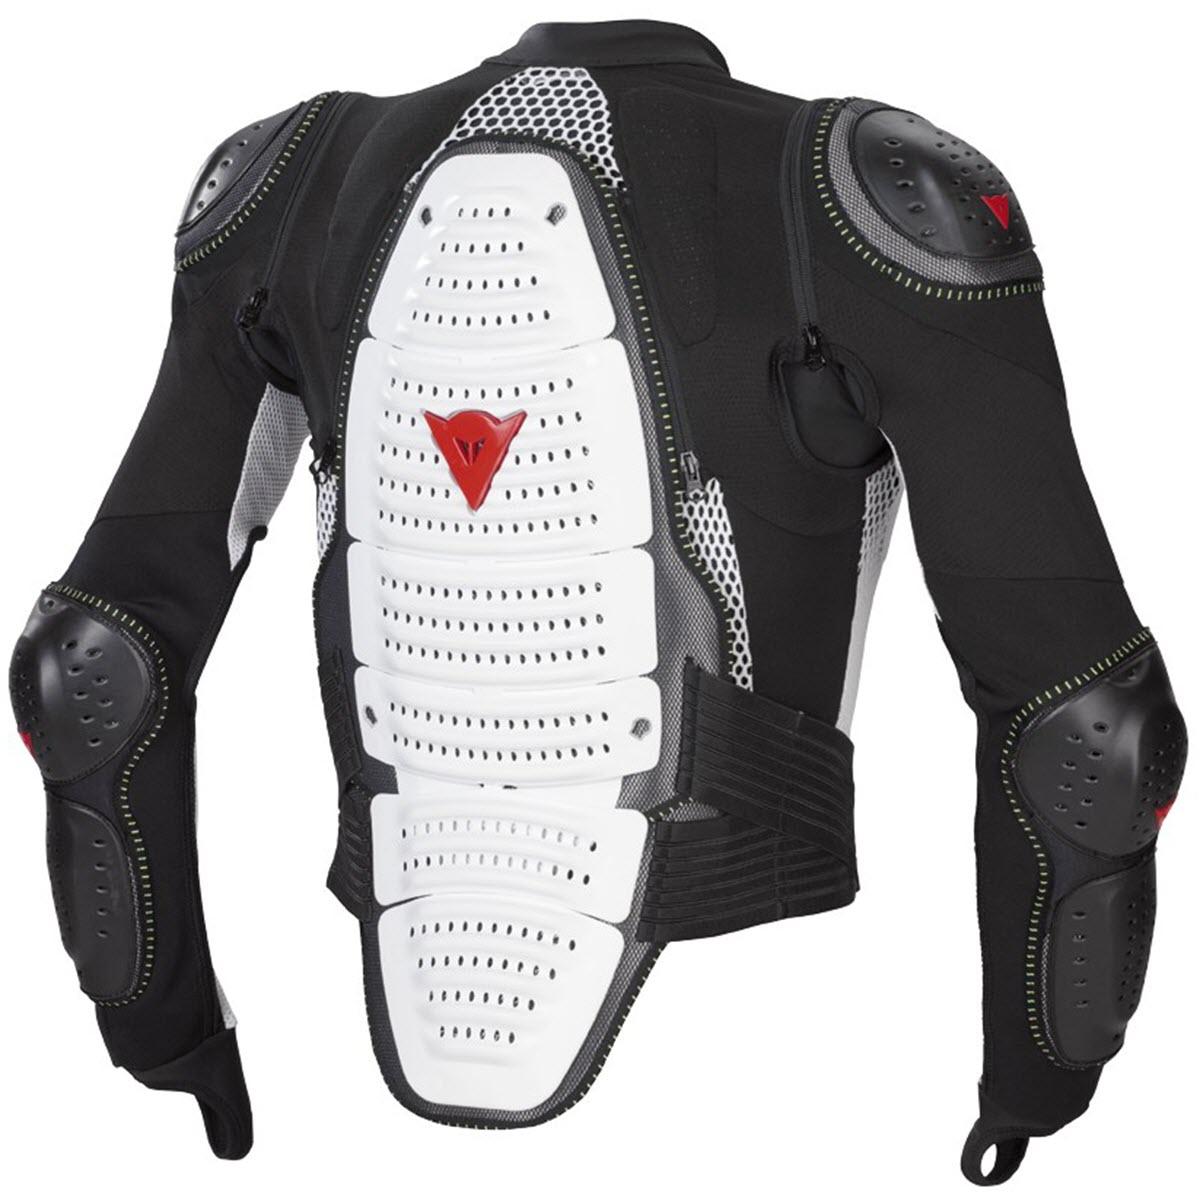 Snowboard armour - Zeppy.io